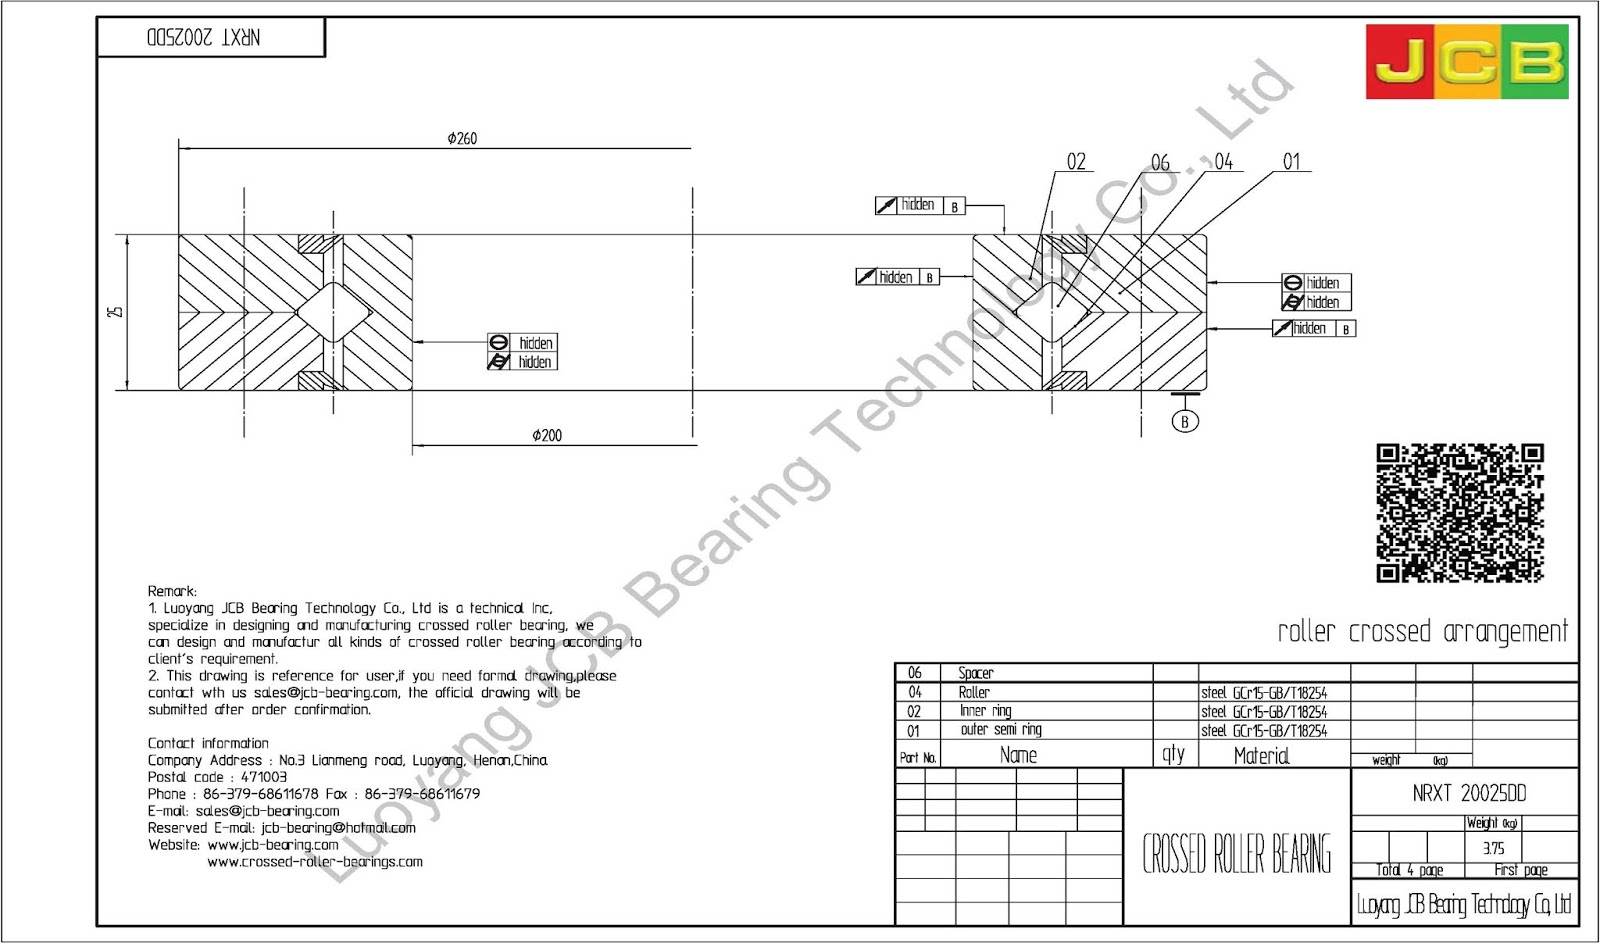 NSK Cross roller bearing: Supply NRXT 20025DD of NSK cross